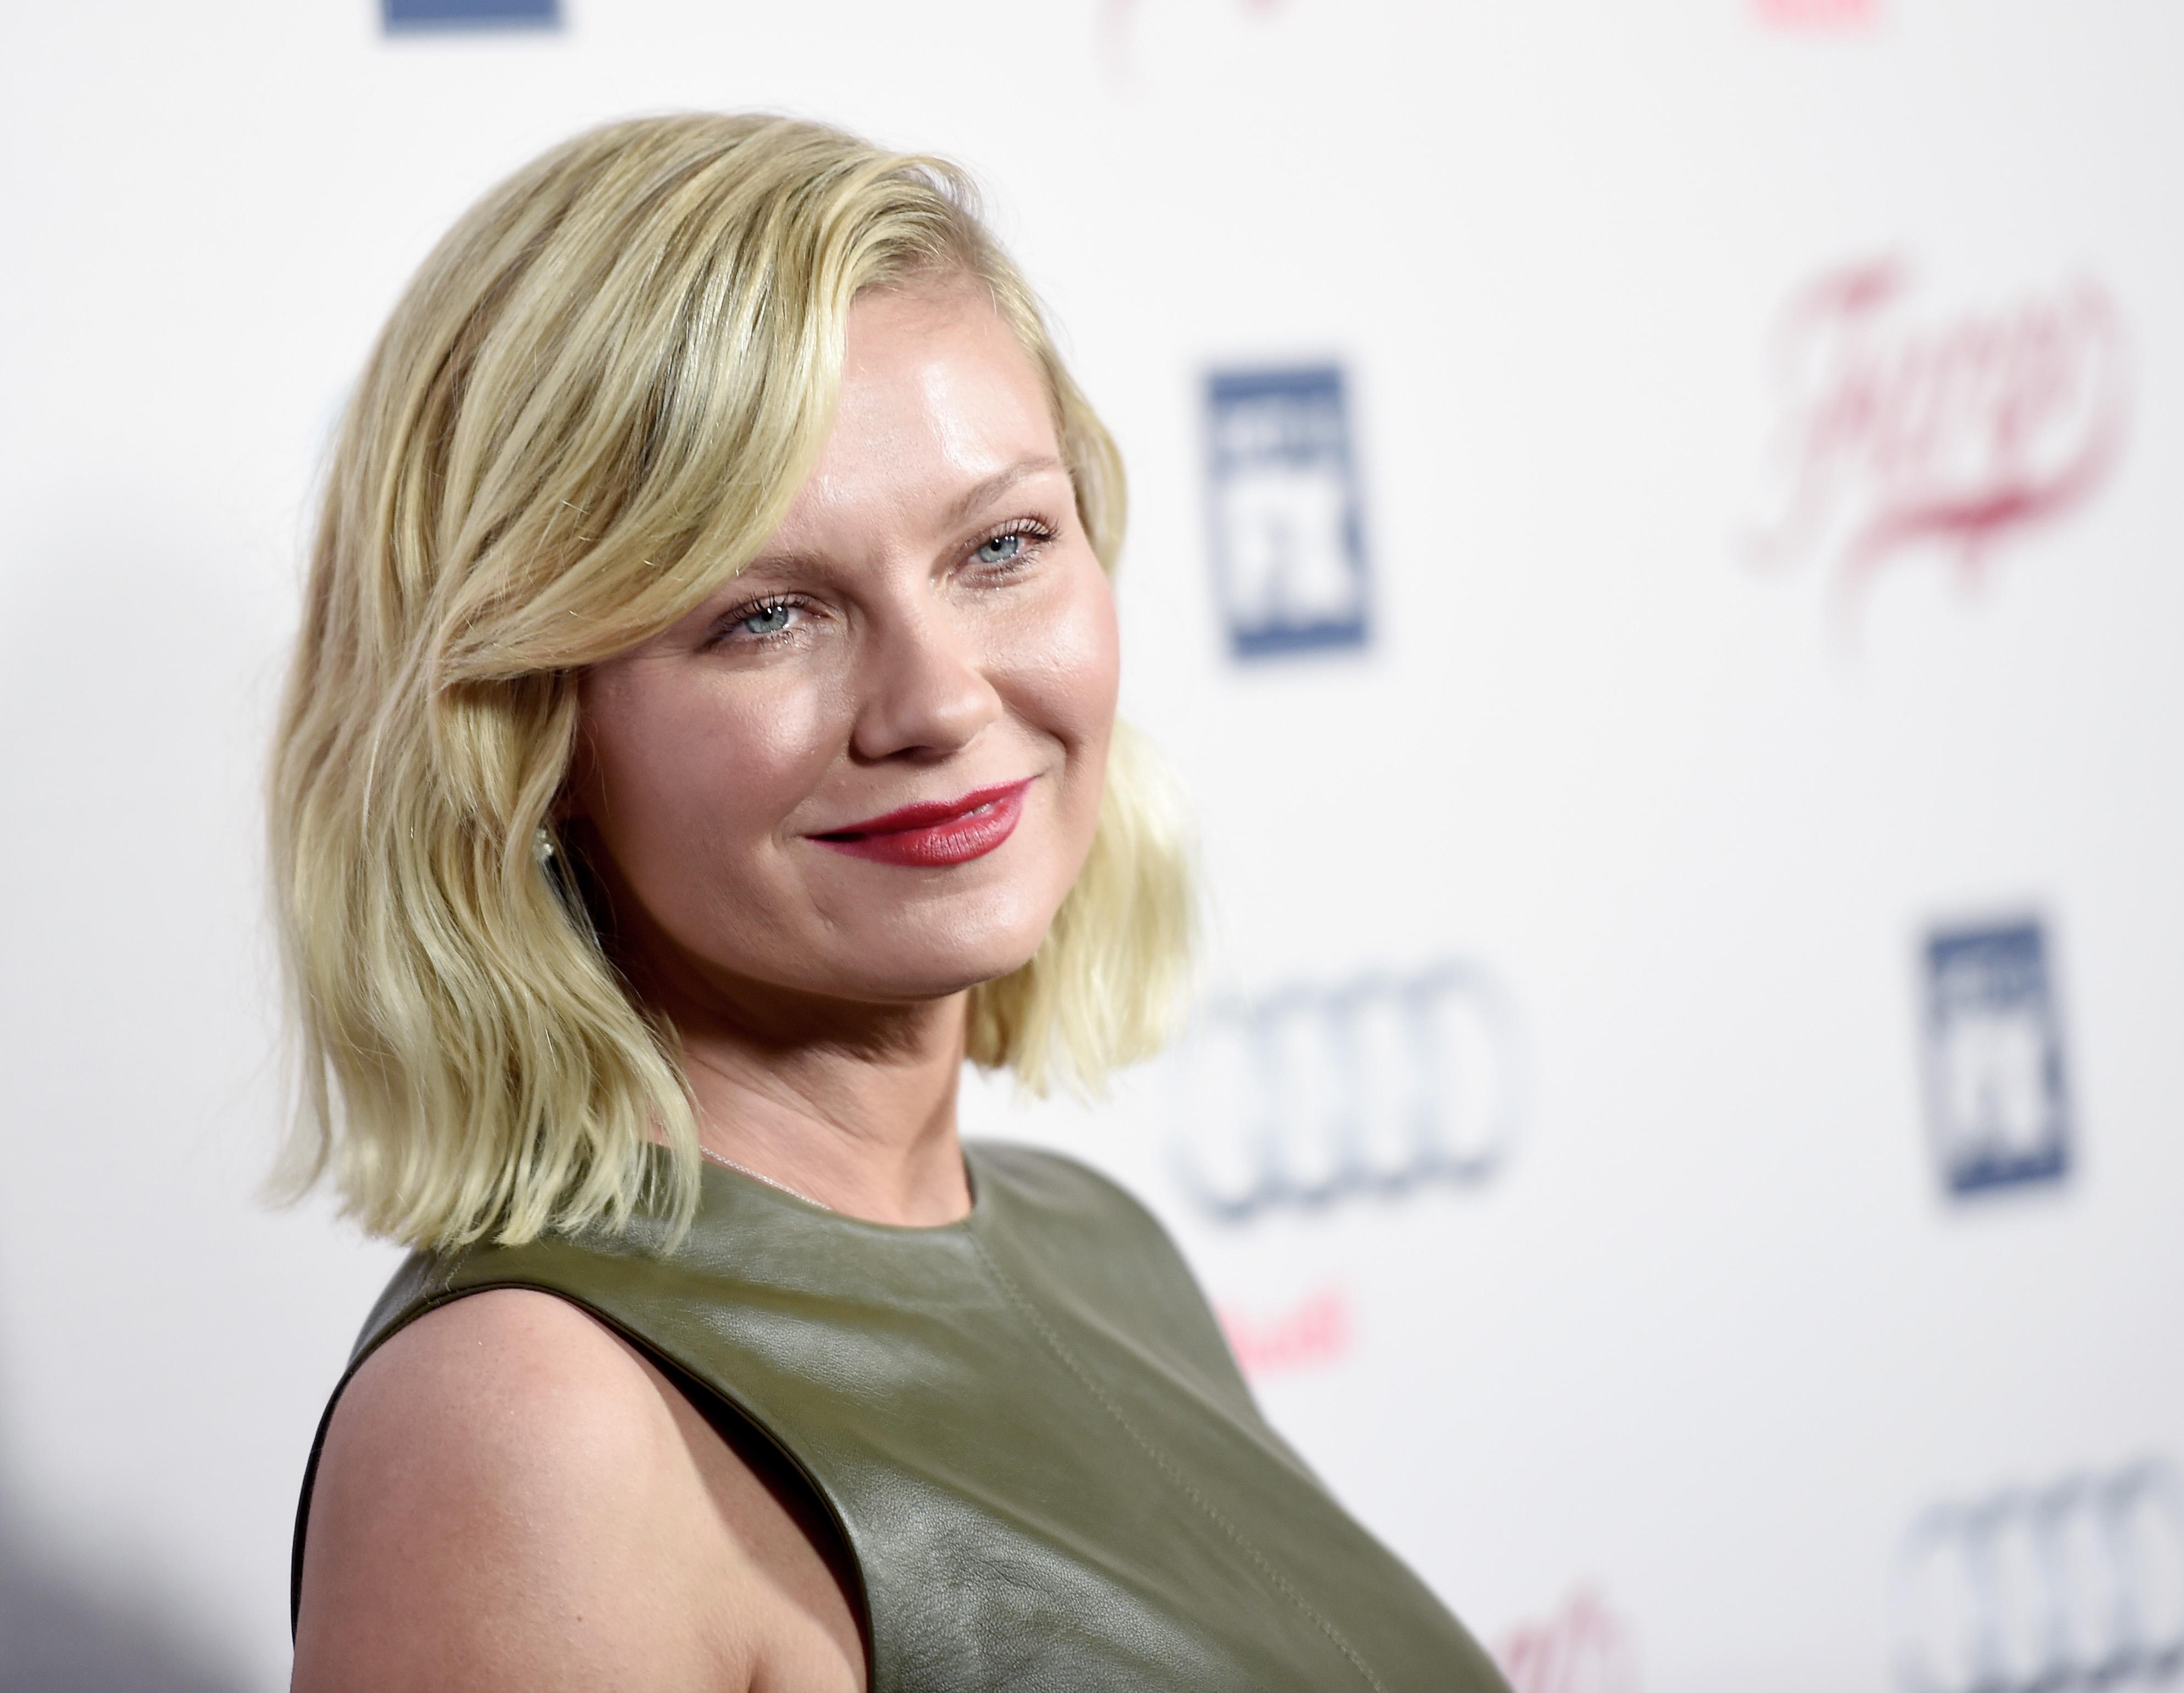 Kirsten Dunst is directing her first movie – Sylvia Plath's The Bell Jar starring Dakota Fanning